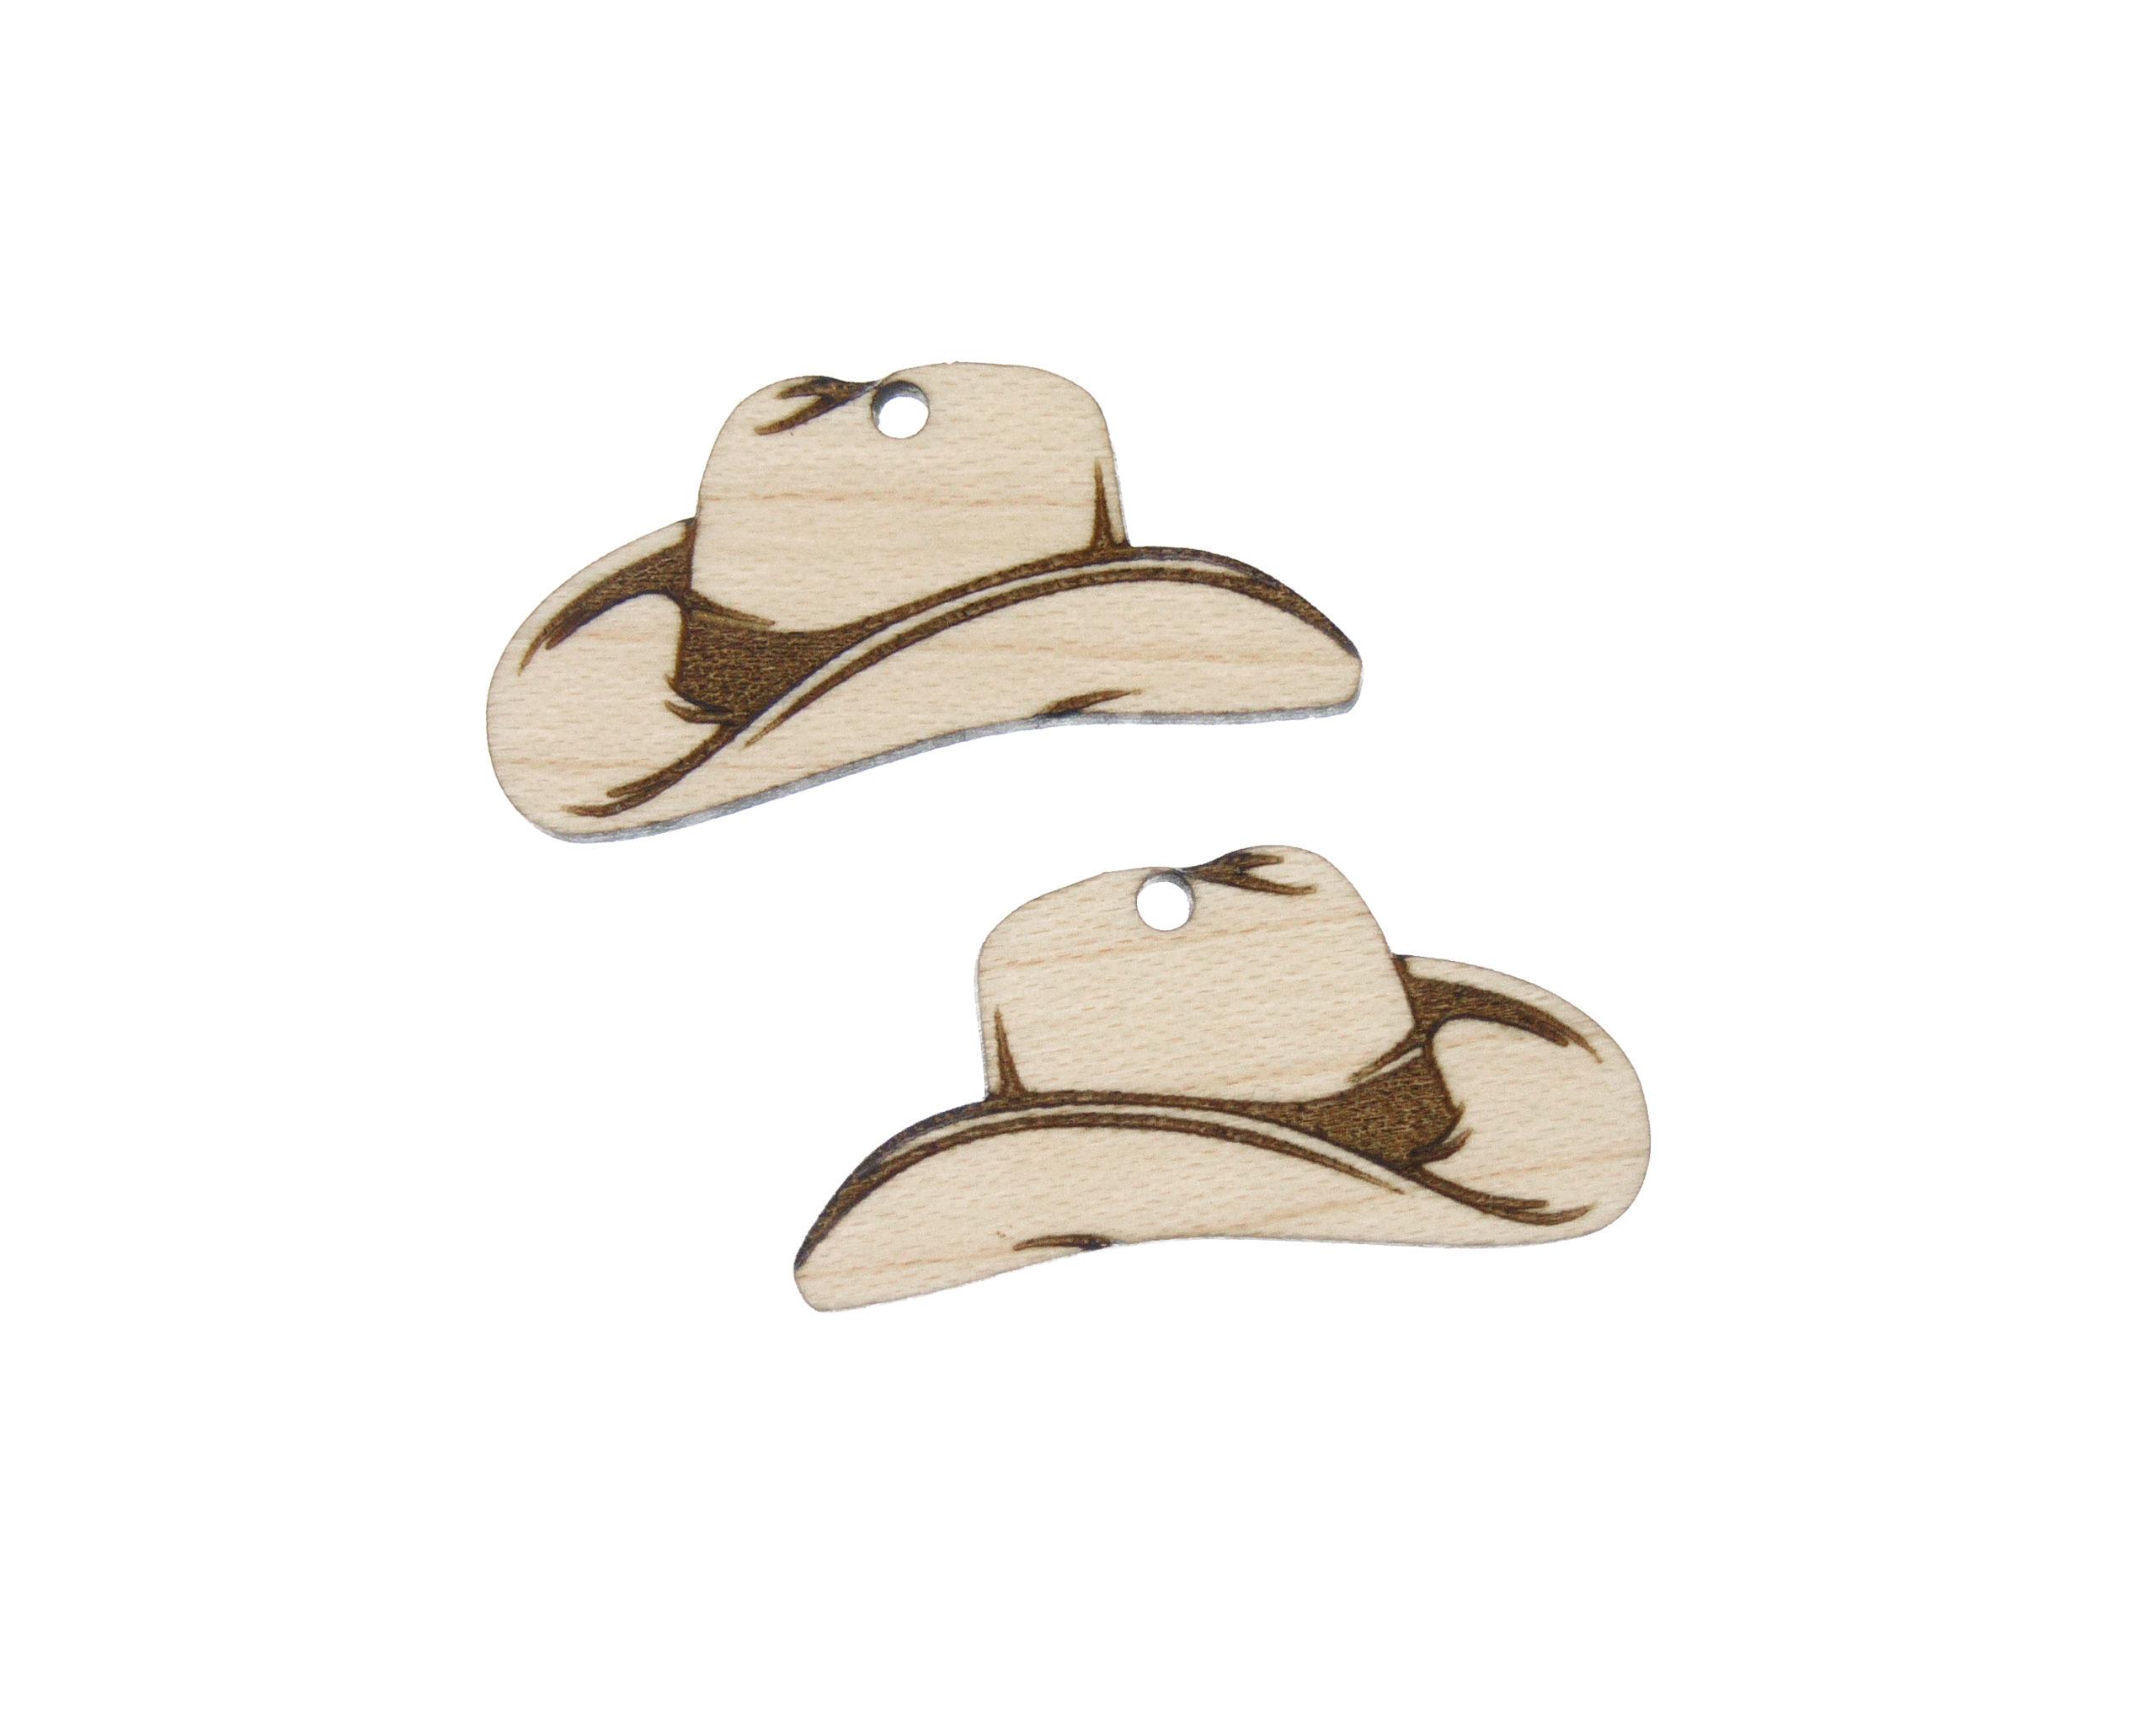 Cowboy Hats Engraved Wood Drop Charms